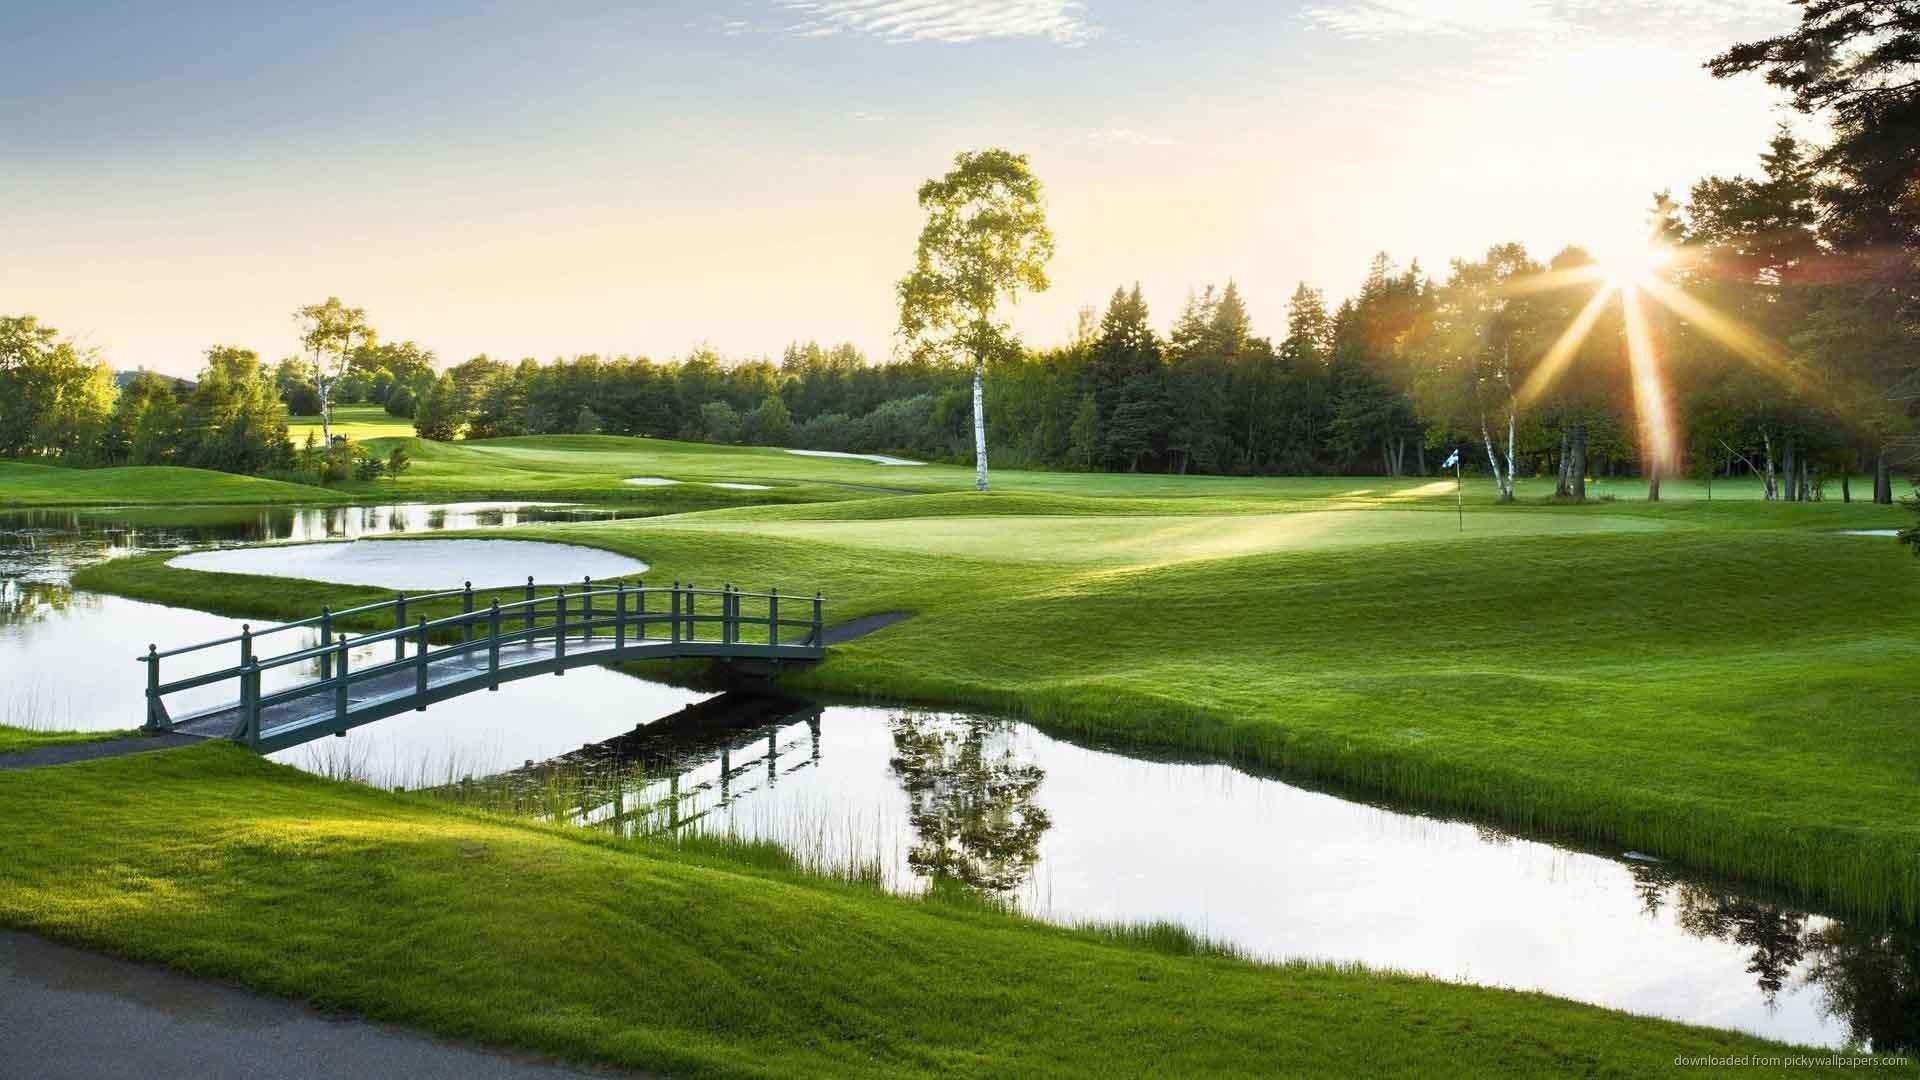 Golf Course Sunset Desktop Wallpaper picture